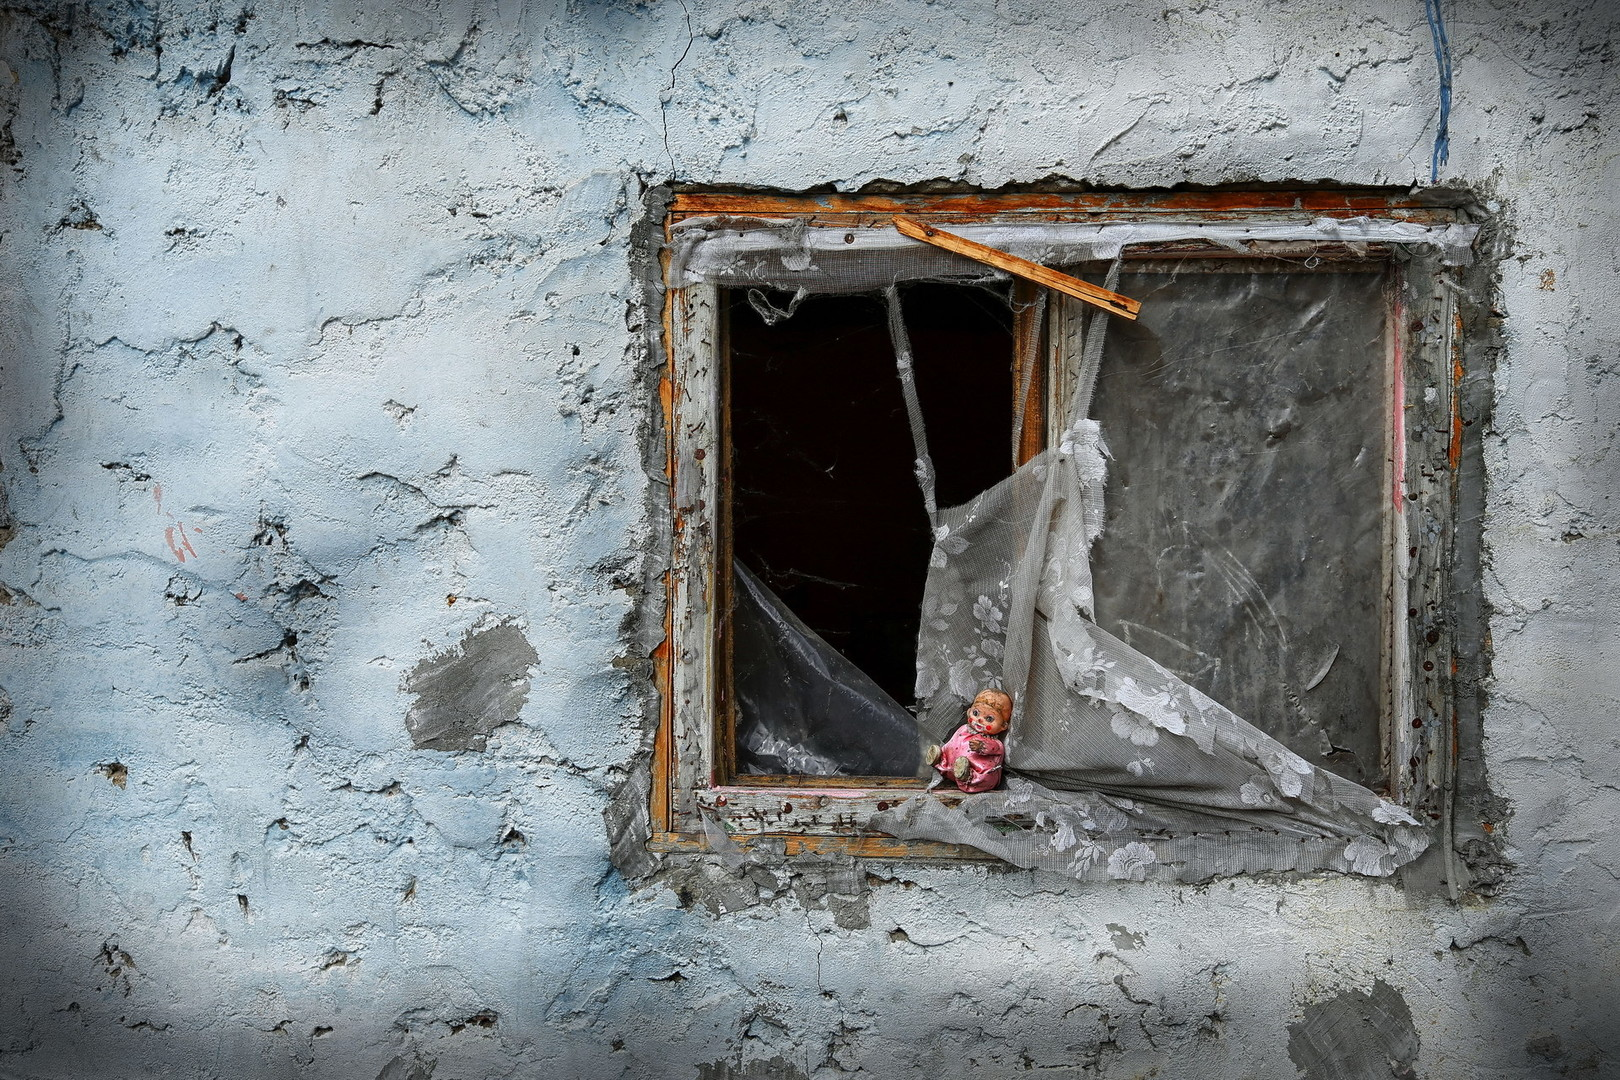 Izgubljeno detinjstvo